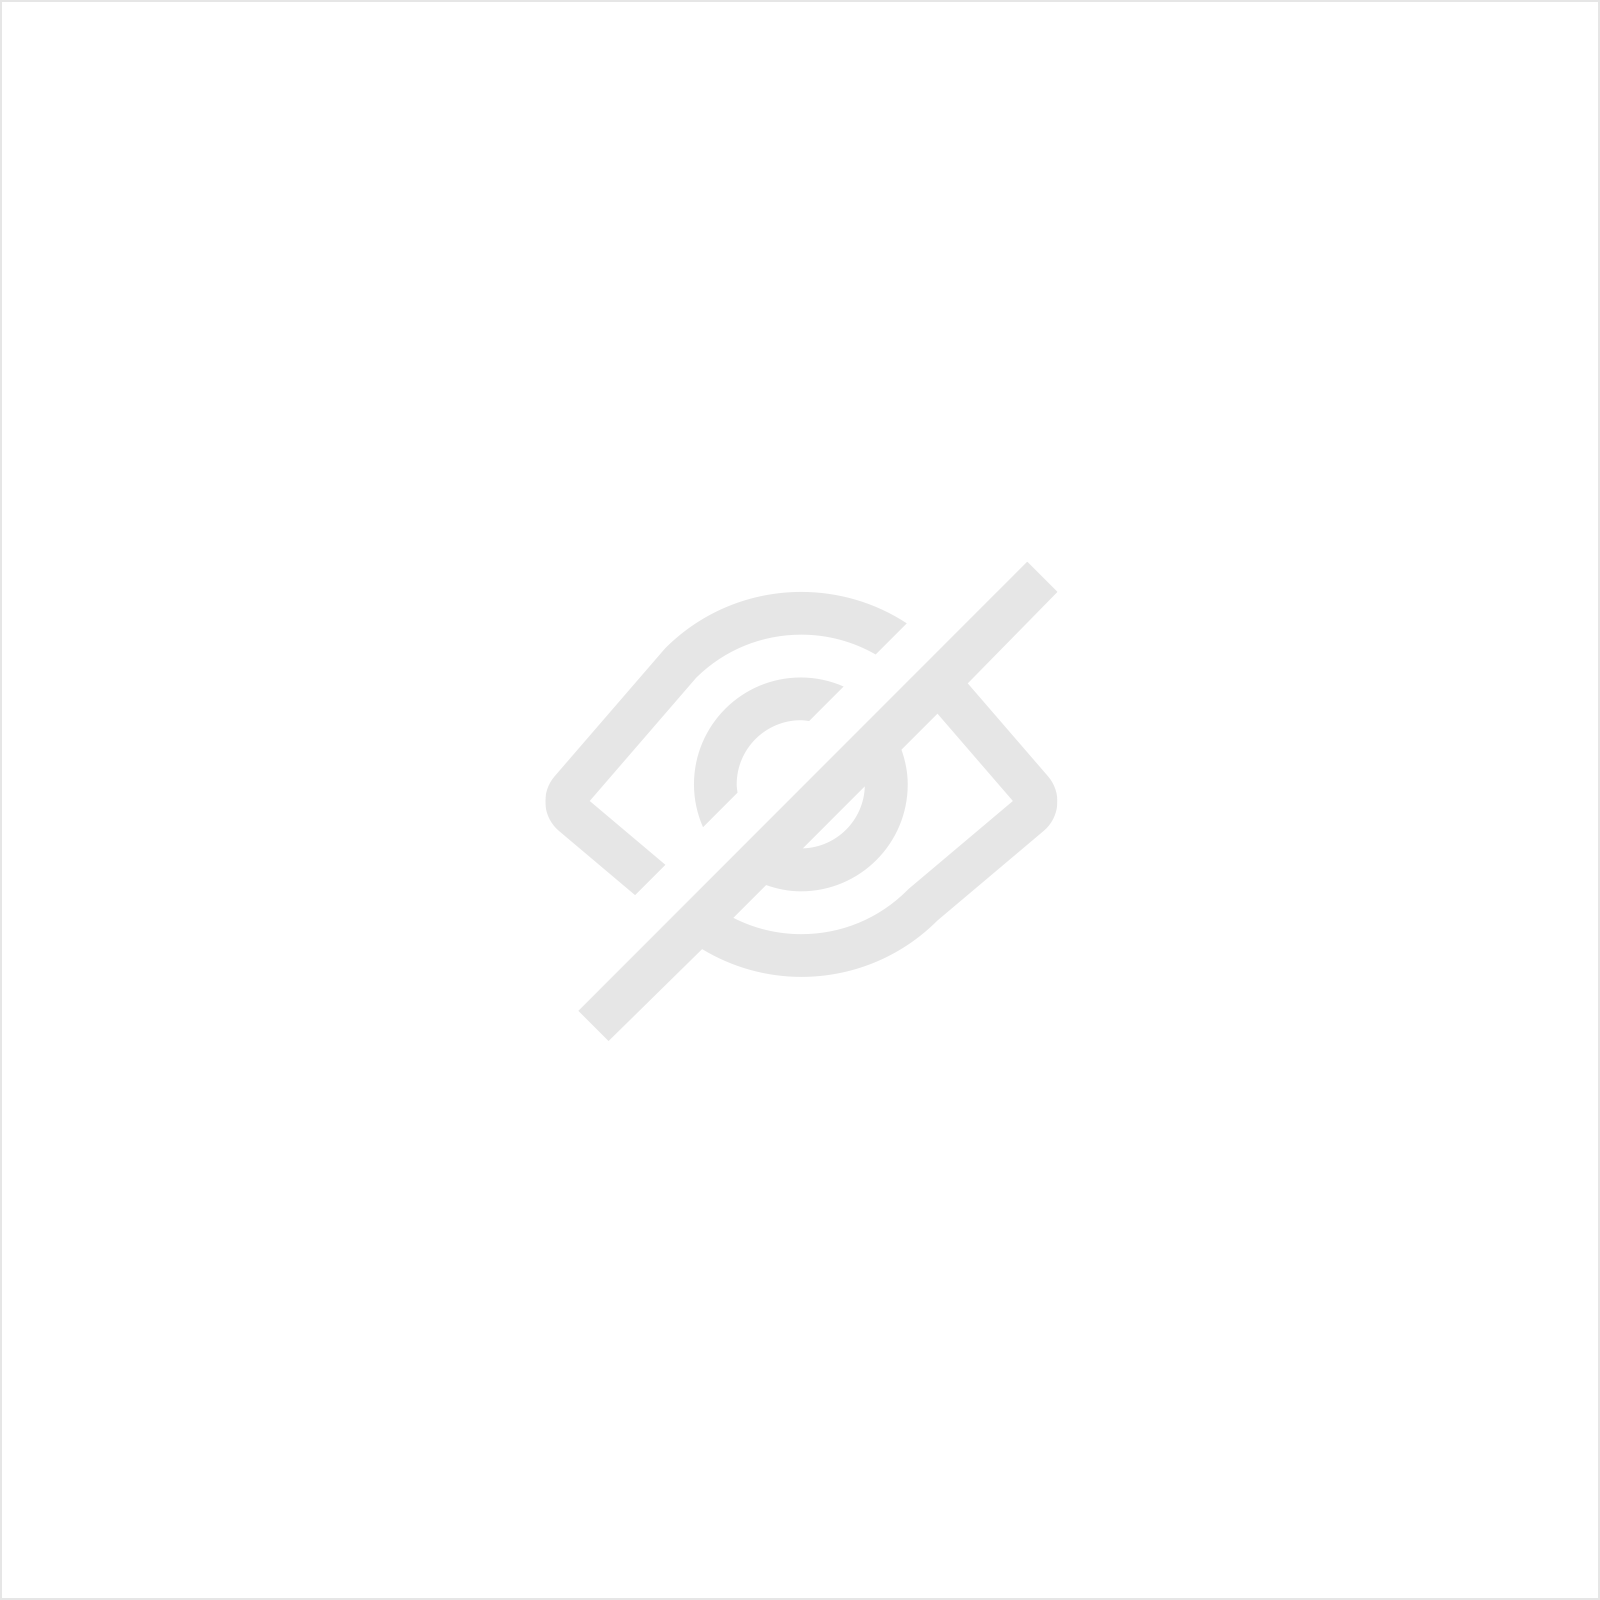 AUTOSOL INOX POLIJSTPASTA AUTOSOL BLIK 750 ML